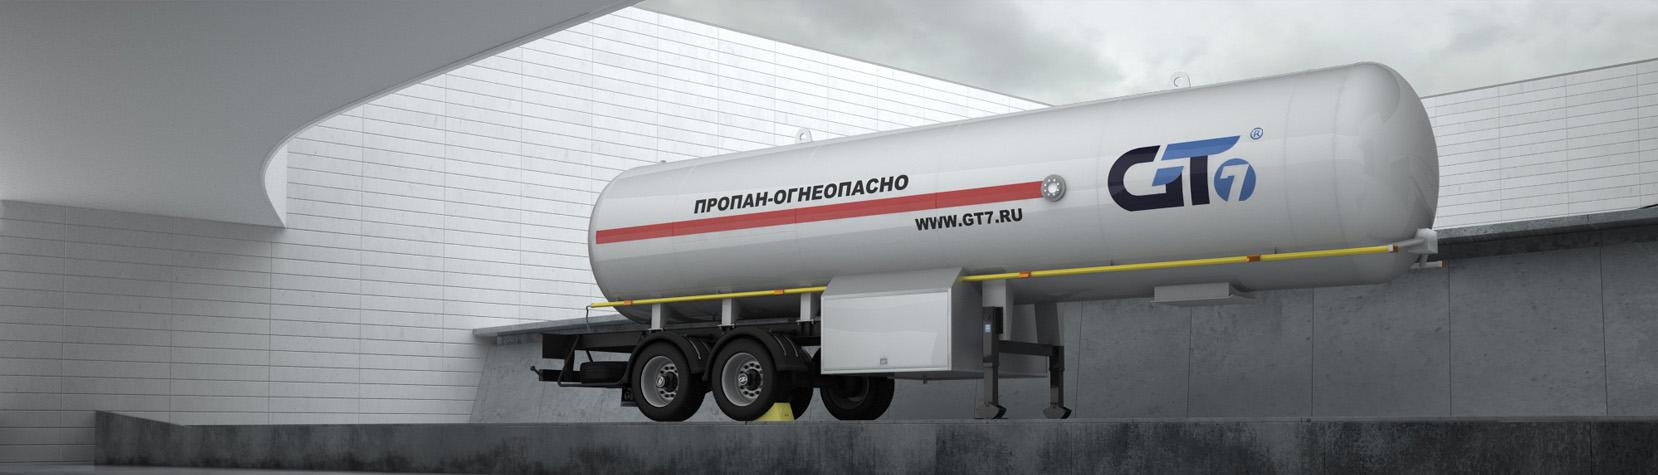 gazovoz-gt7-01-1